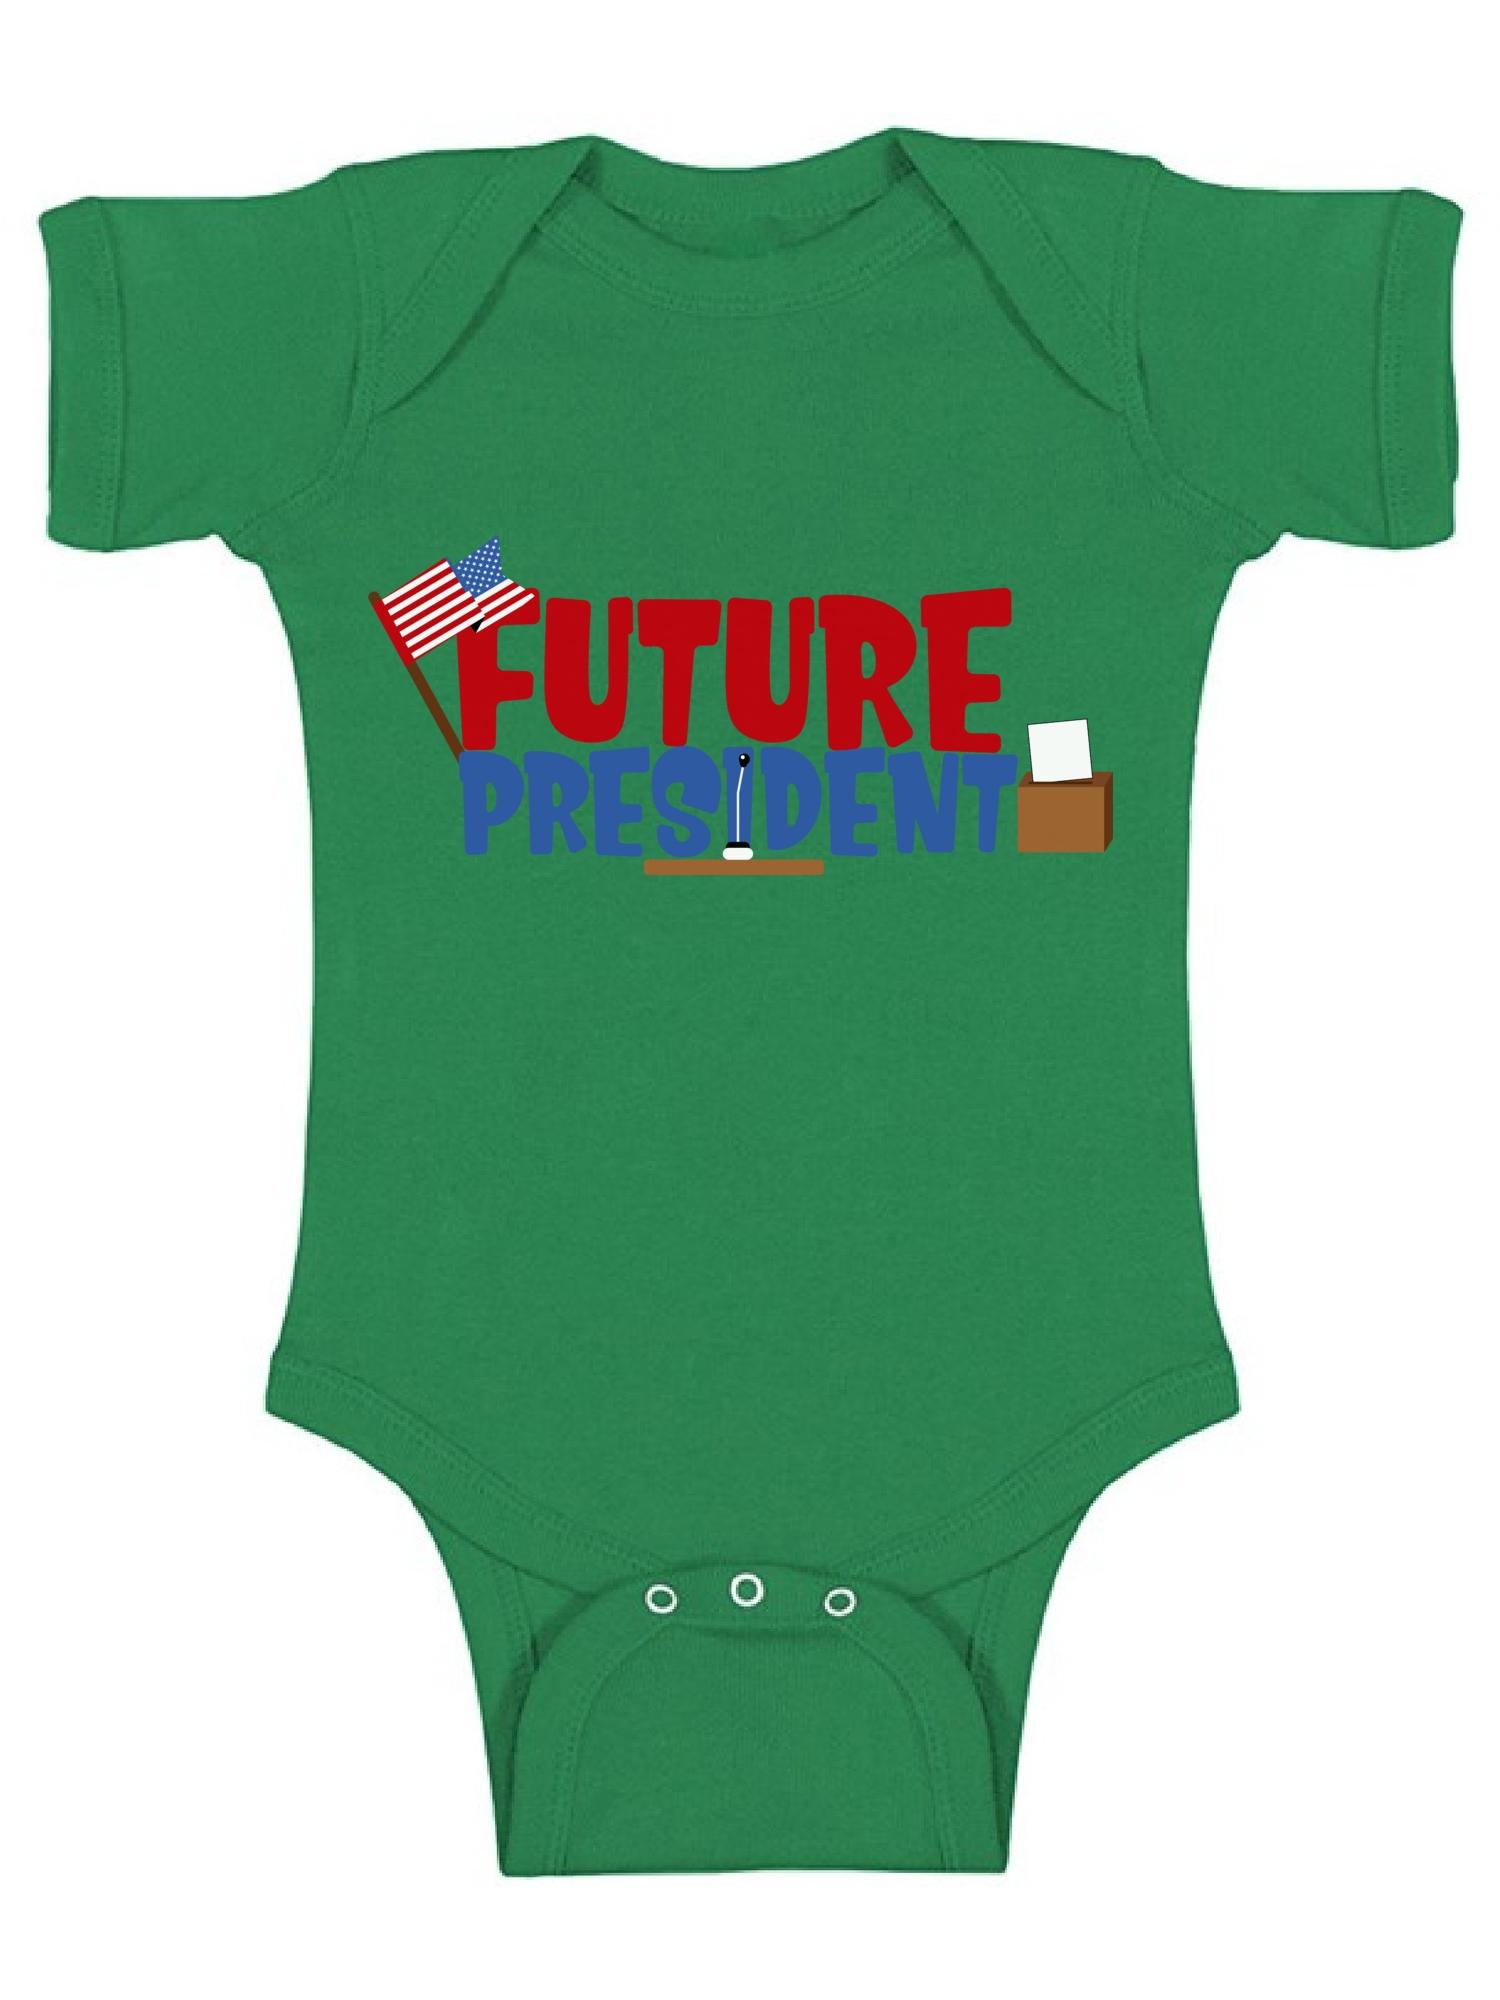 Awkward Styles Future President Bodysuit fo Newborn Baby for 1Year Old